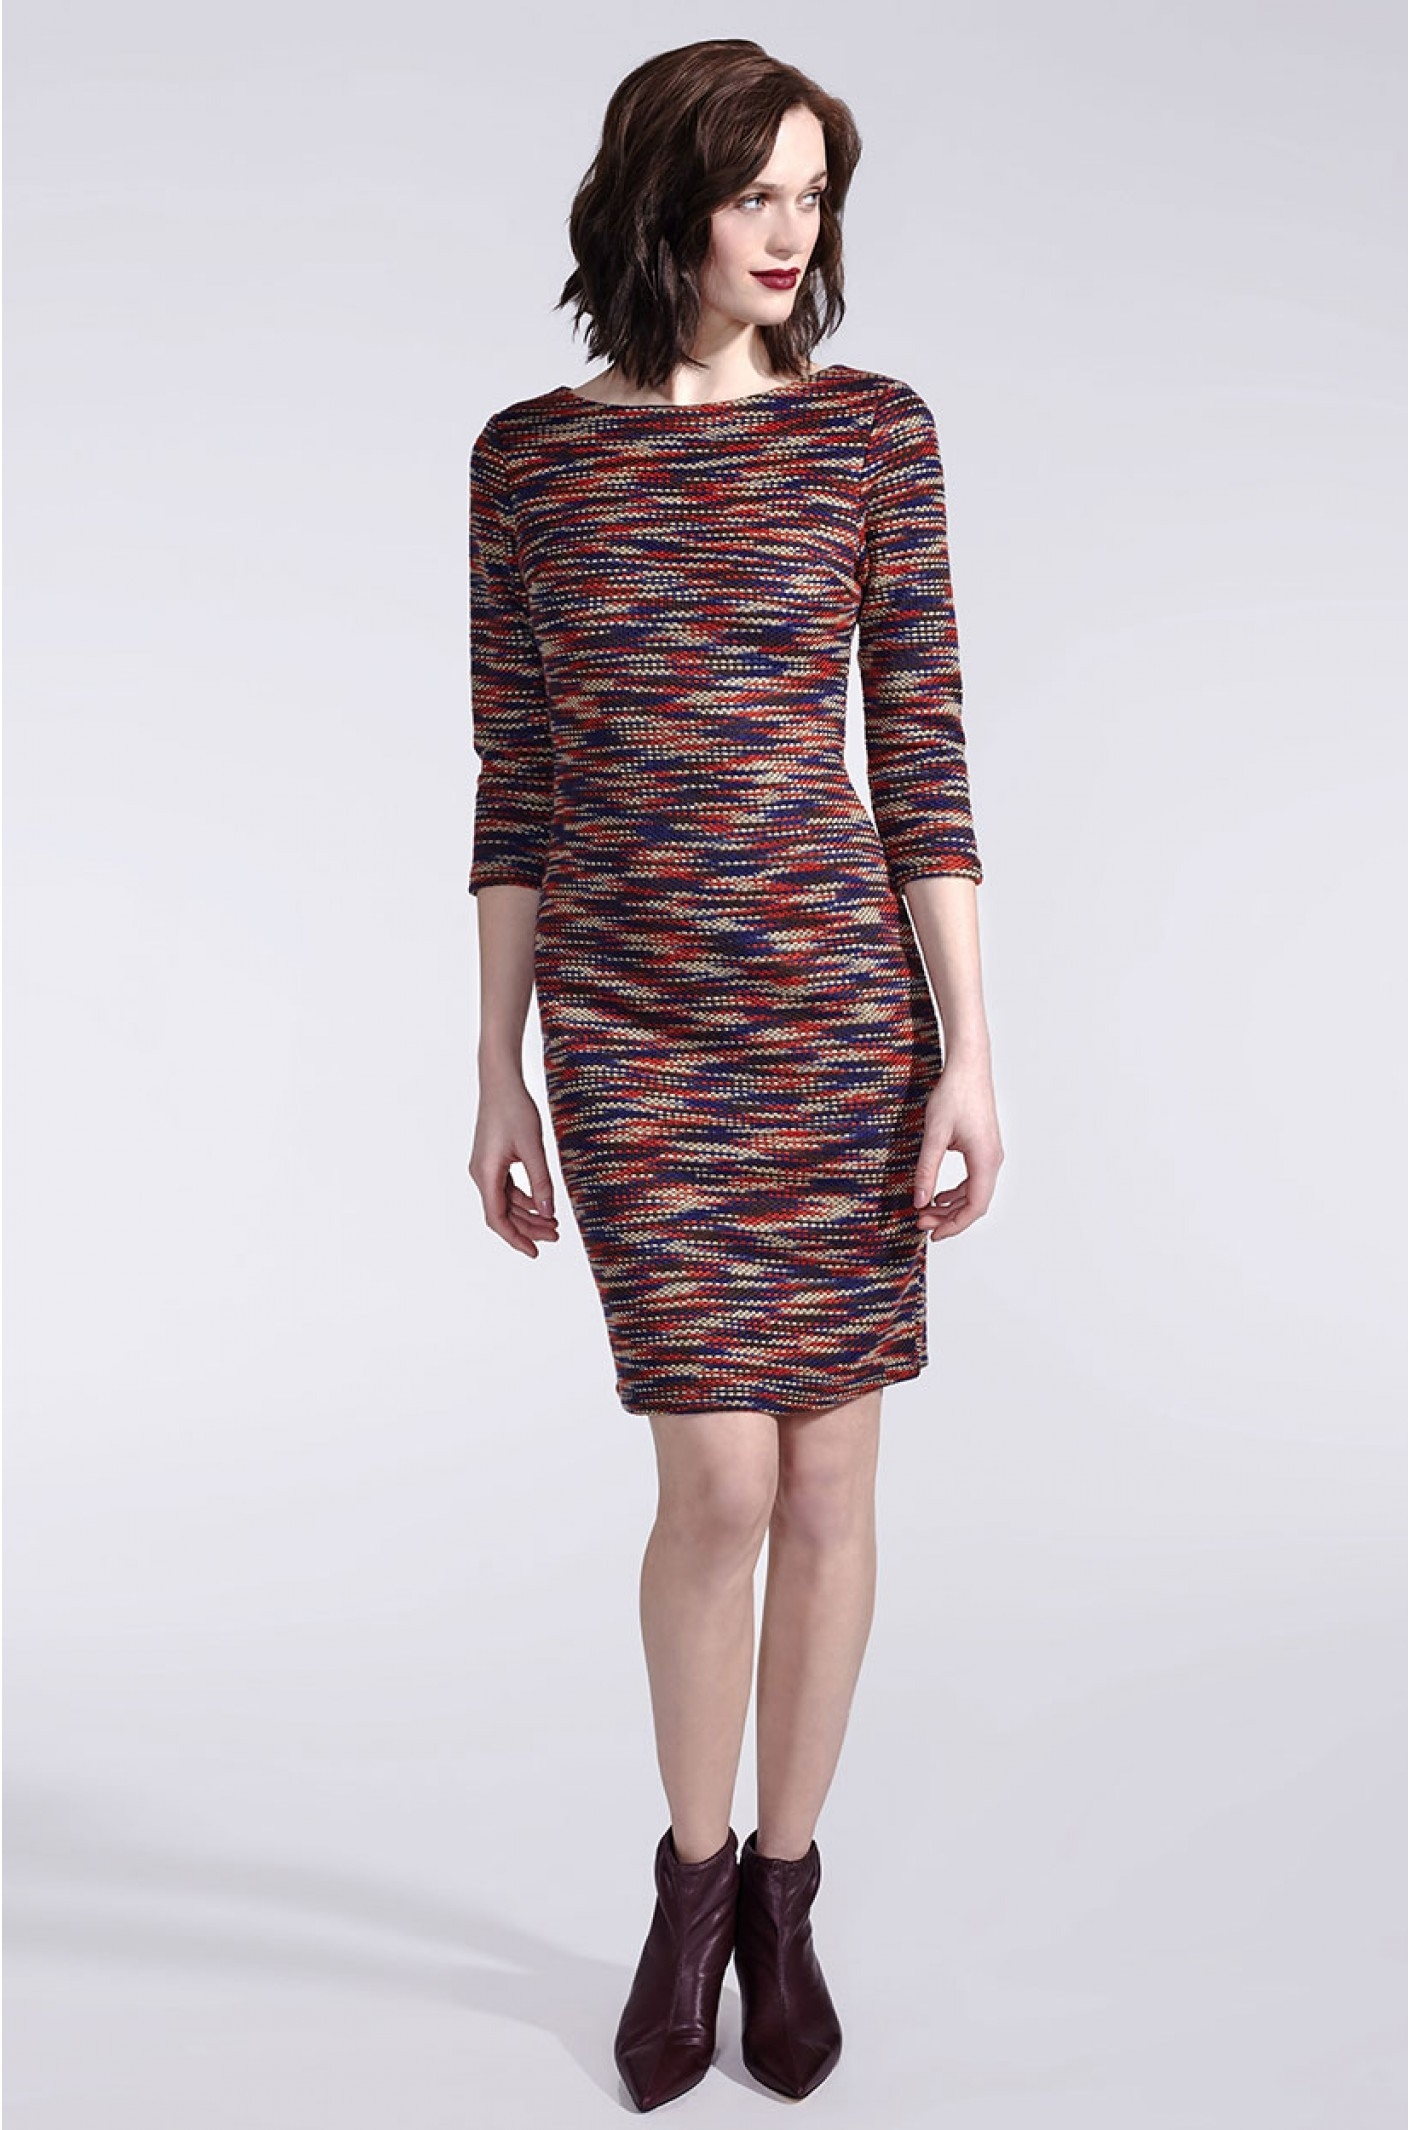 10 Großartig Langarm Kleider Elegant Bester PreisFormal Erstaunlich Langarm Kleider Elegant Stylish